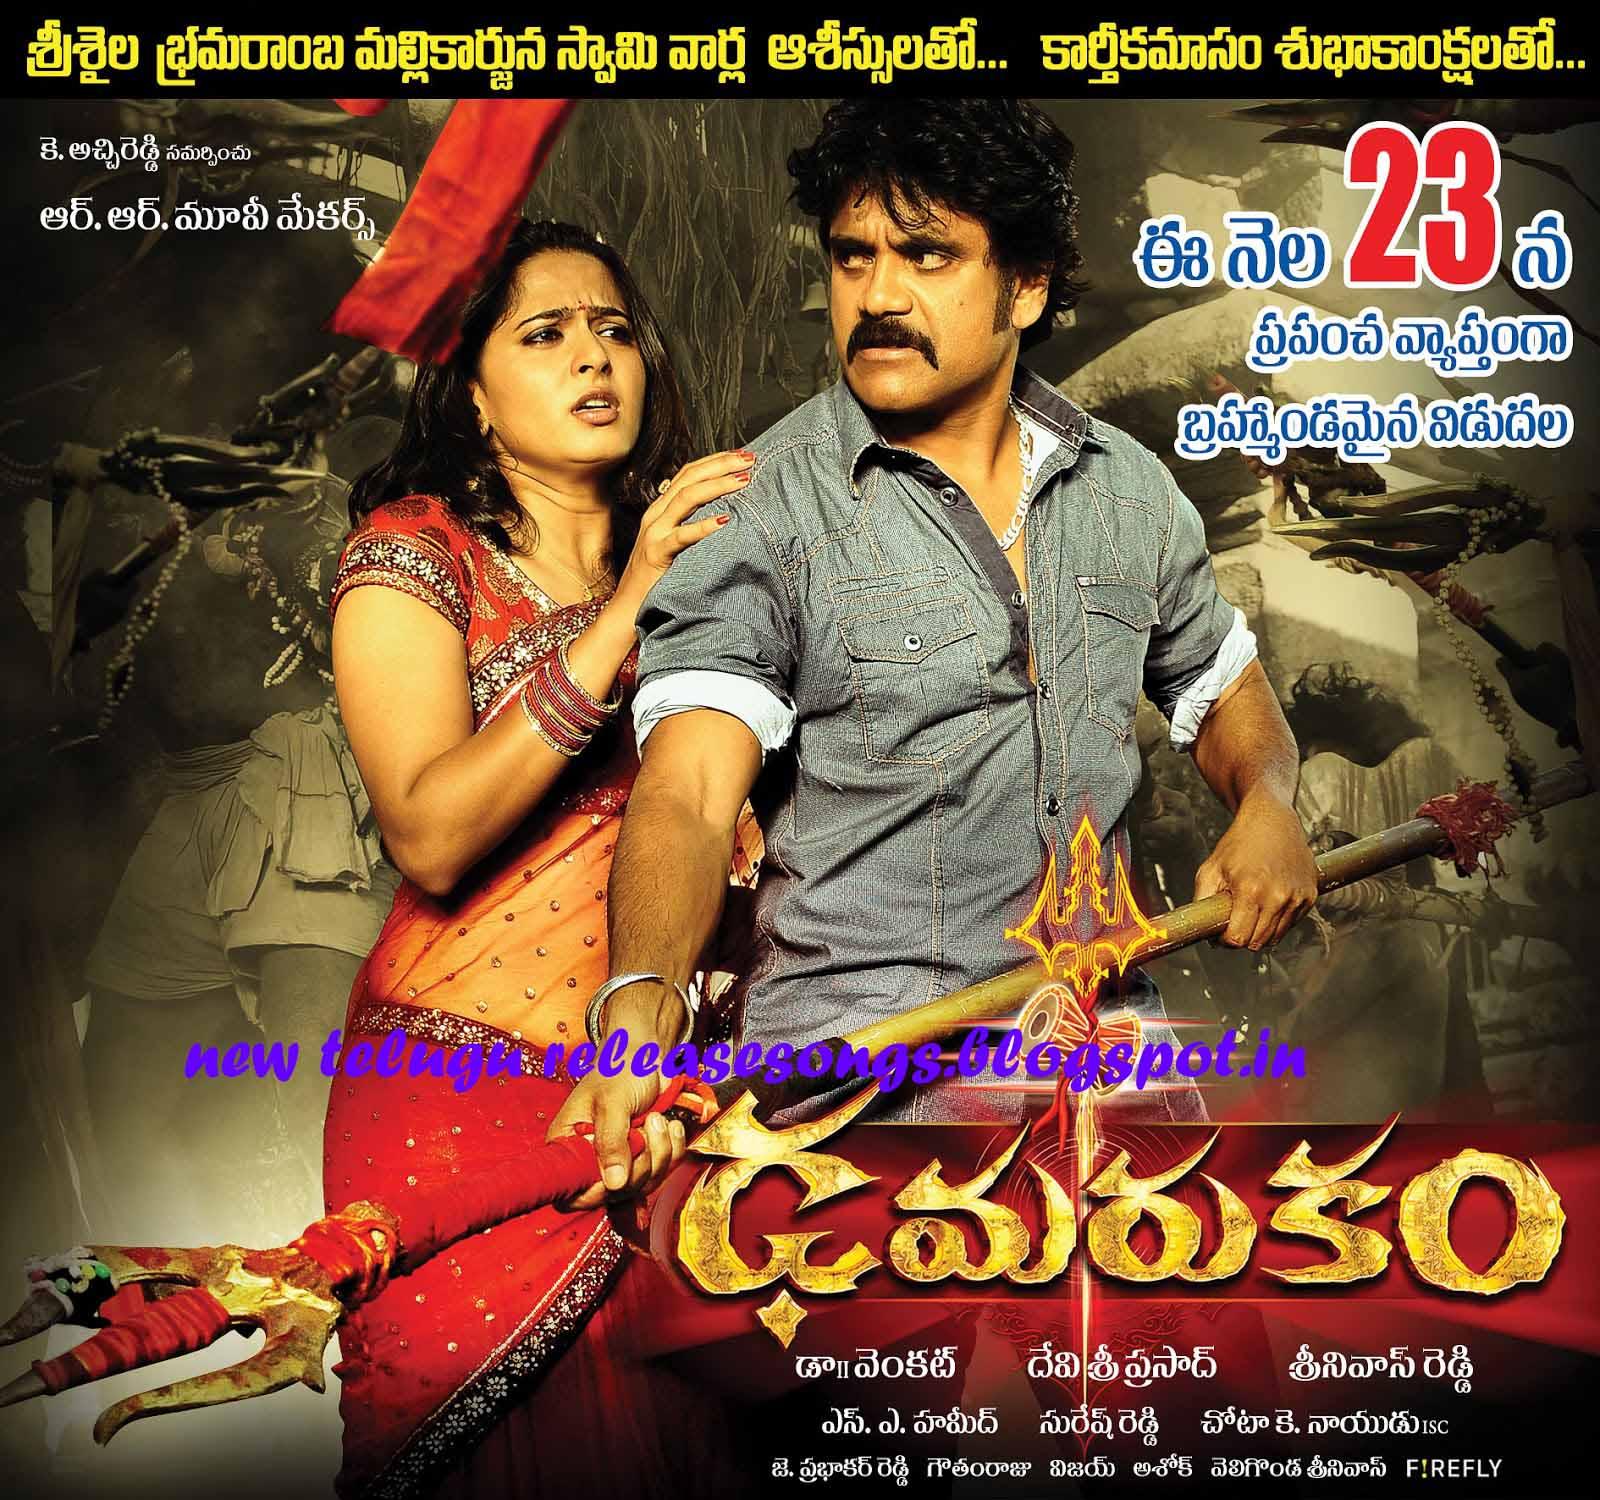 Prabhu Deva Tamannah S Abhinetri Audio Date Official: New Telugu Release Songs: Damarukam New Release Date